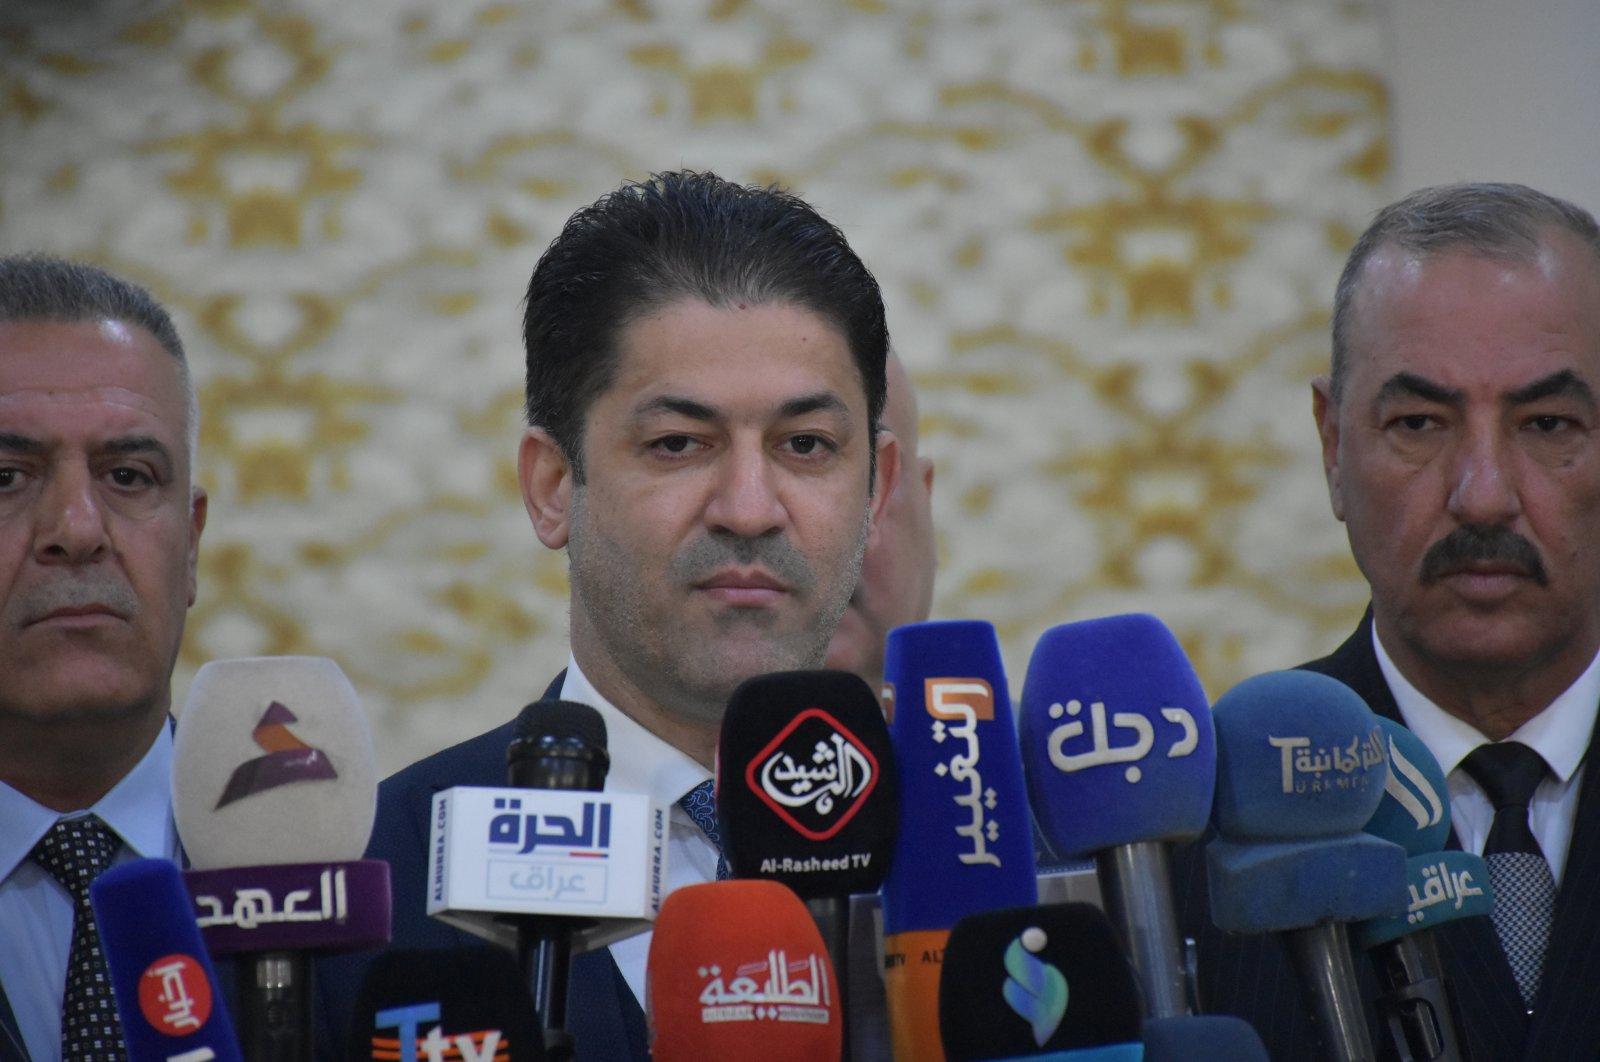 Iraqi Turkmen Front (ITC) Kirkuk Provincial Deputy Chairperson Kahtan Vindavi speaks to reporters in Kirkuk, Iraq, Dec. 28, 2020. (AA Photo)